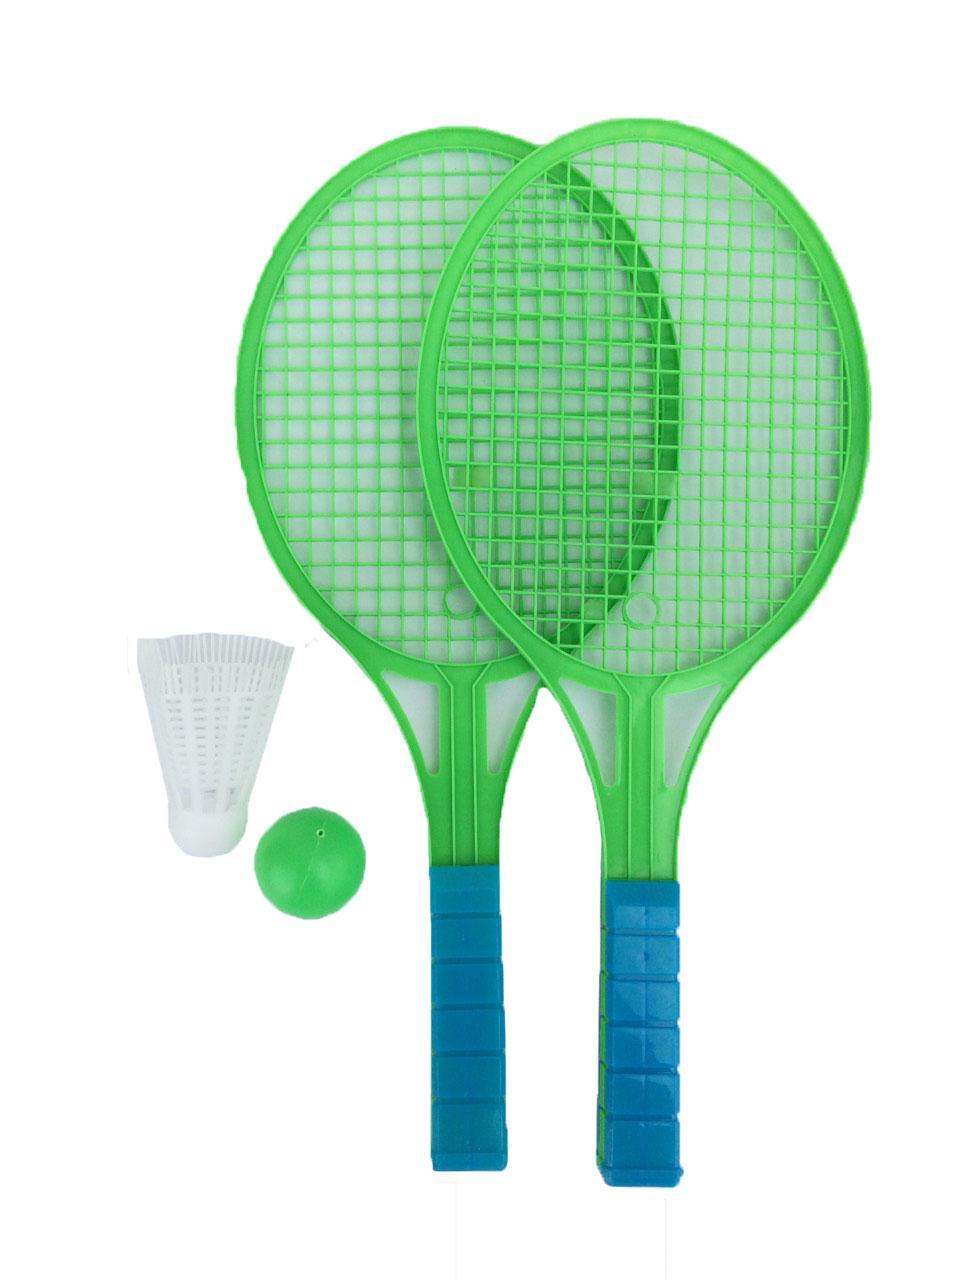 Badminton 1 Set Double Light Mini Badminton Tennis Racket Kids Educational Sports Games